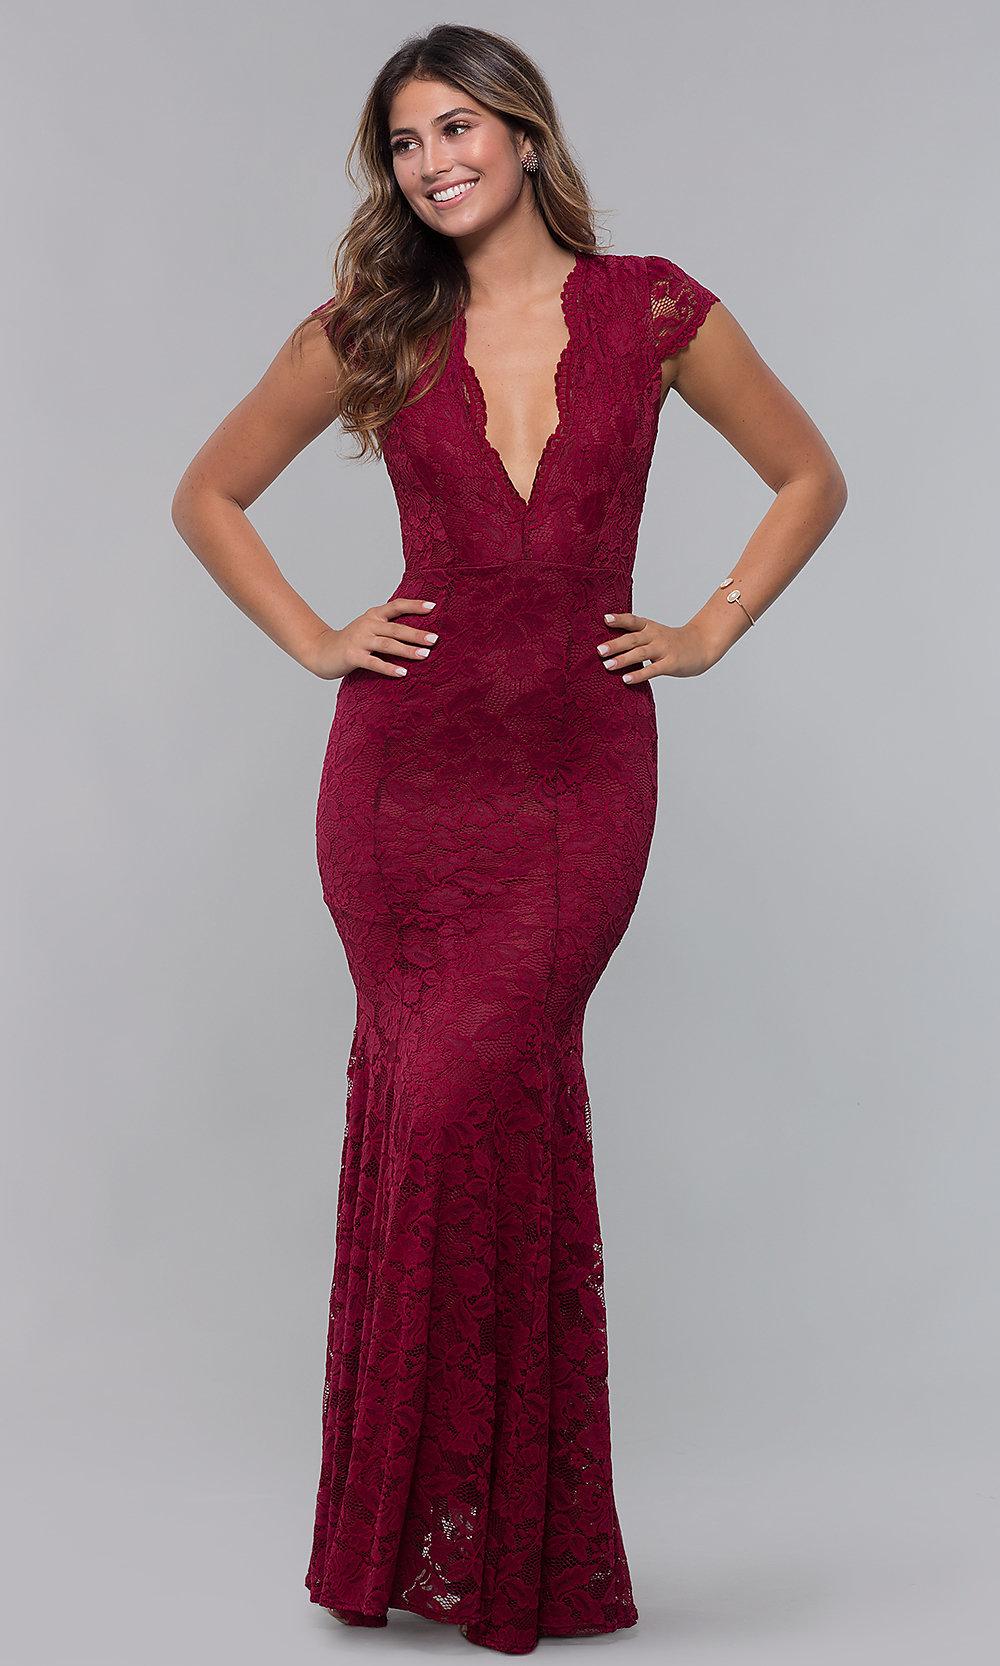 Long open back V-neck red prom dress